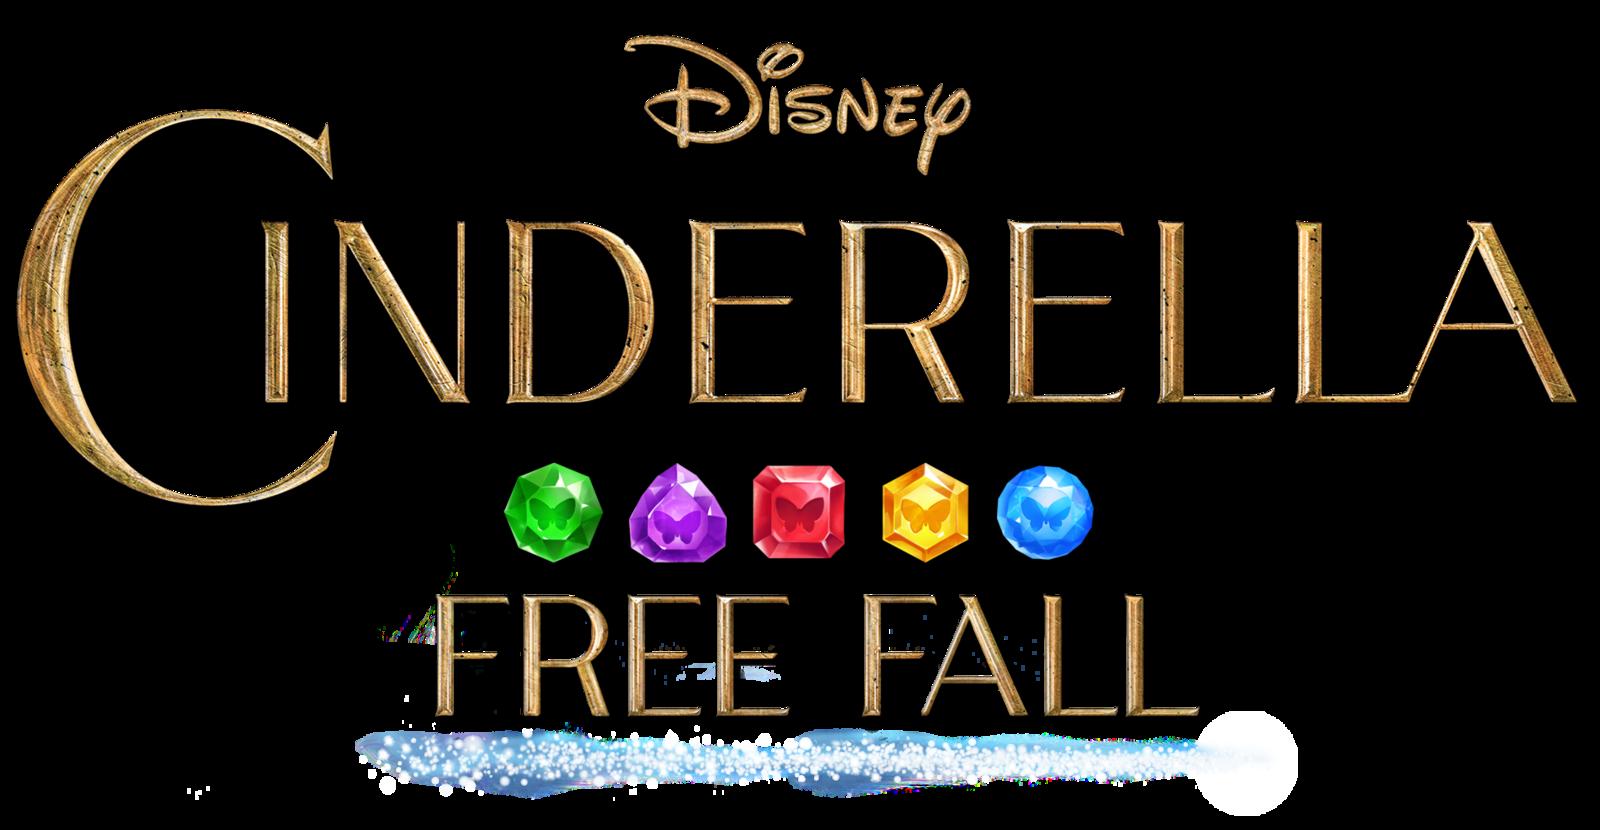 Cinderela: Free Fall